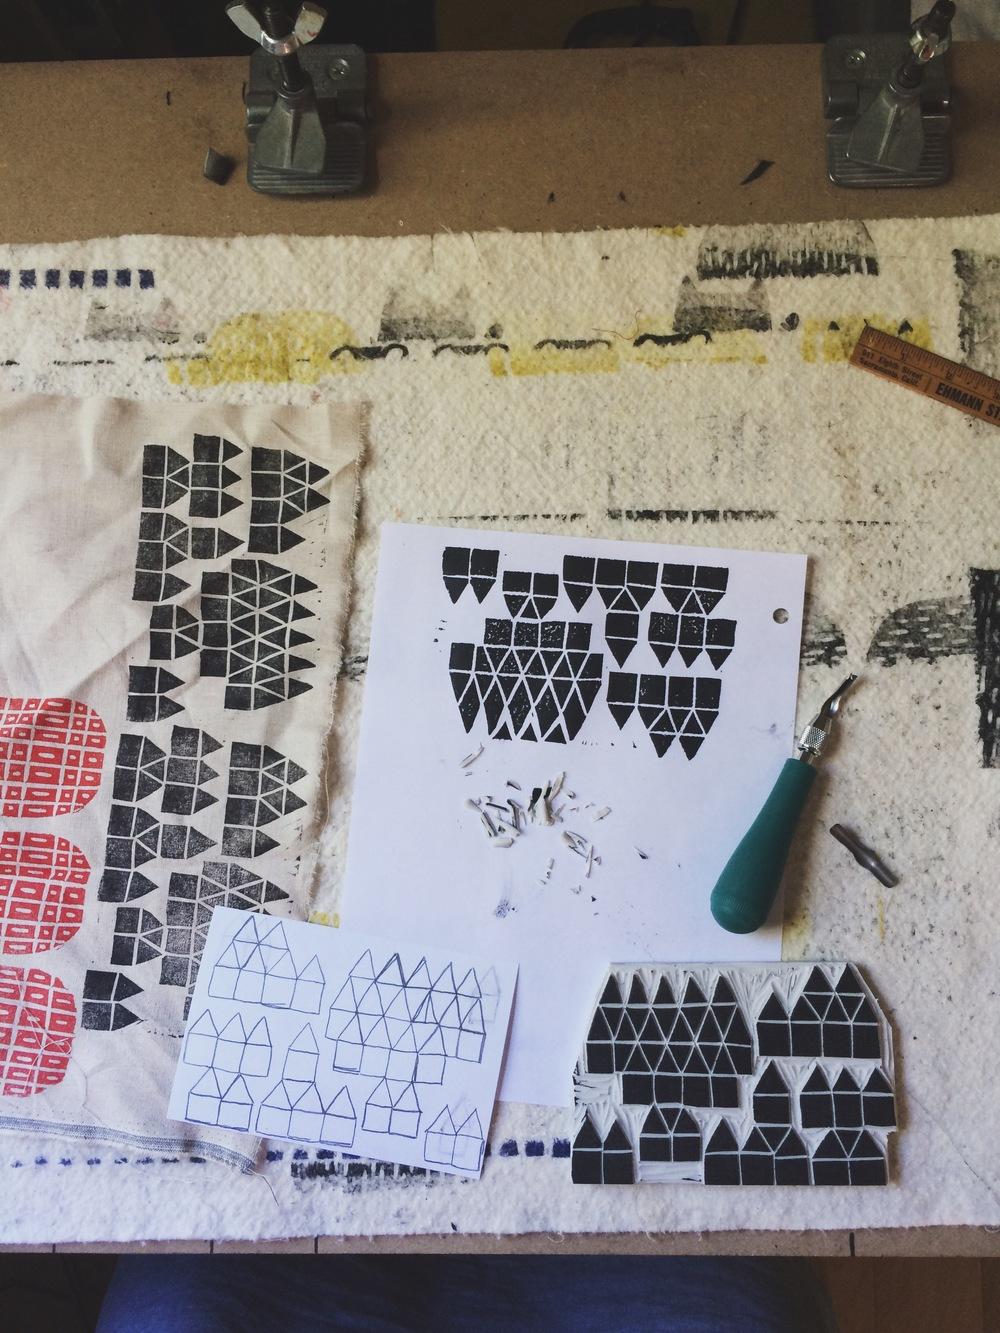 Sketching and carving blocks for printing, Sarah Golden